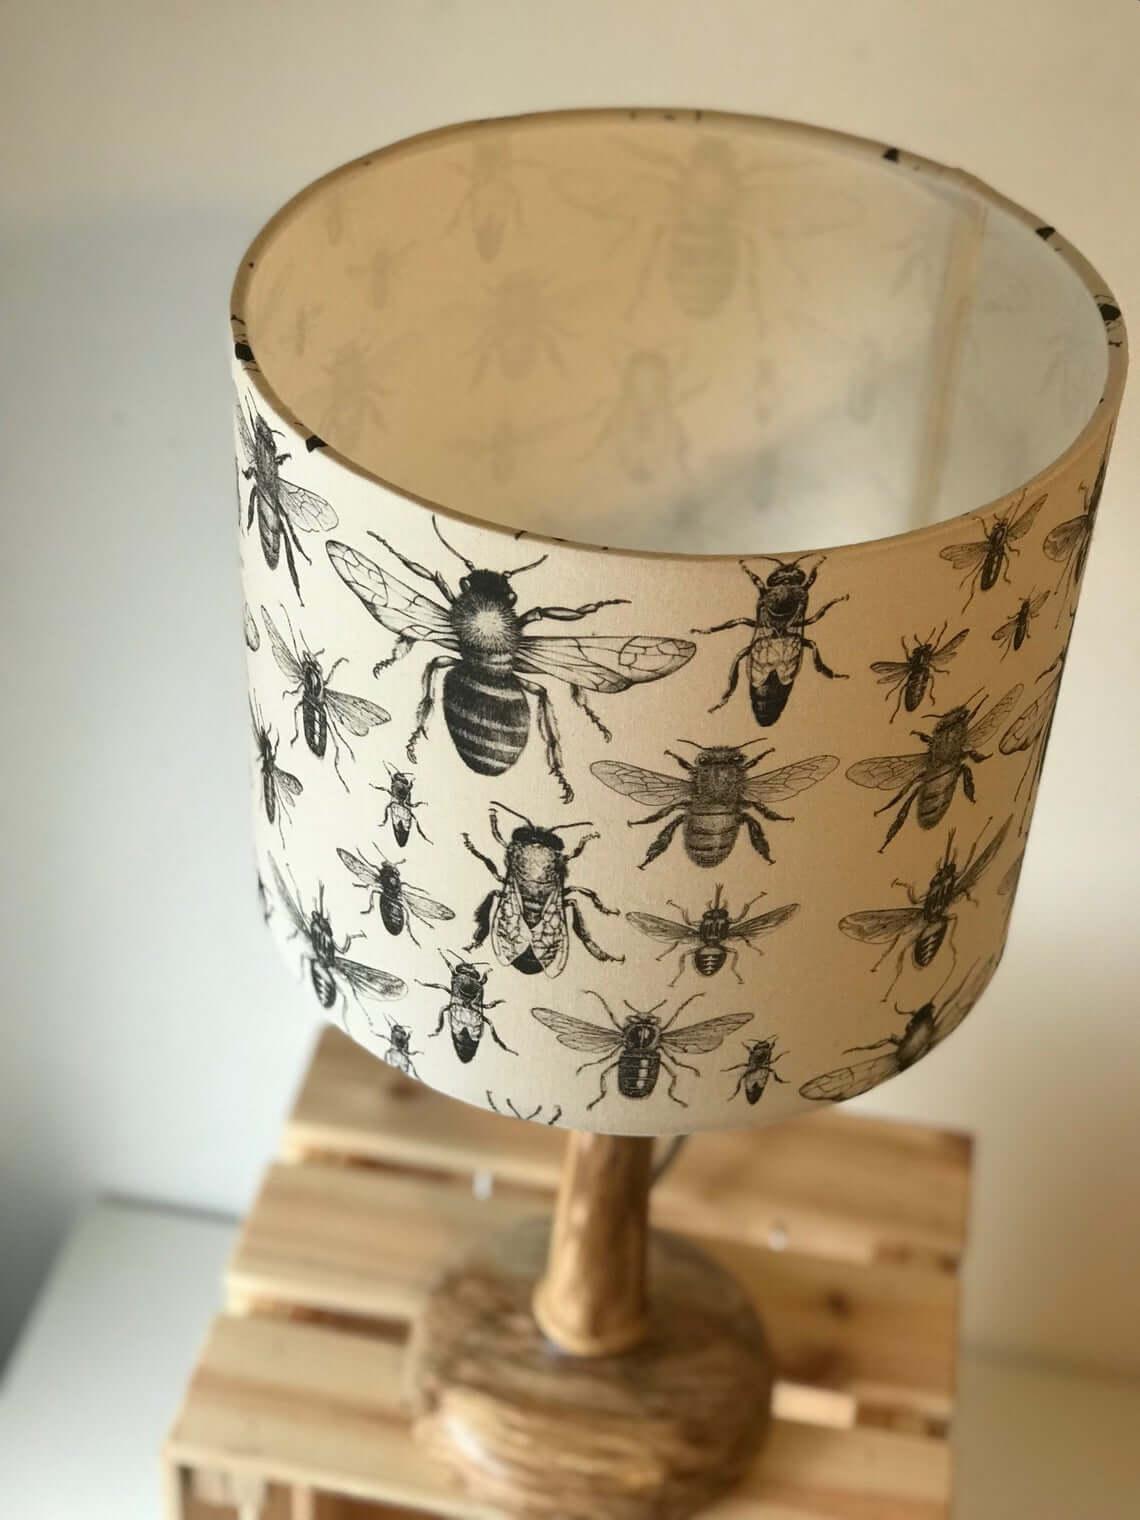 Monochrome Detailed Bee Drum Lamp Shade